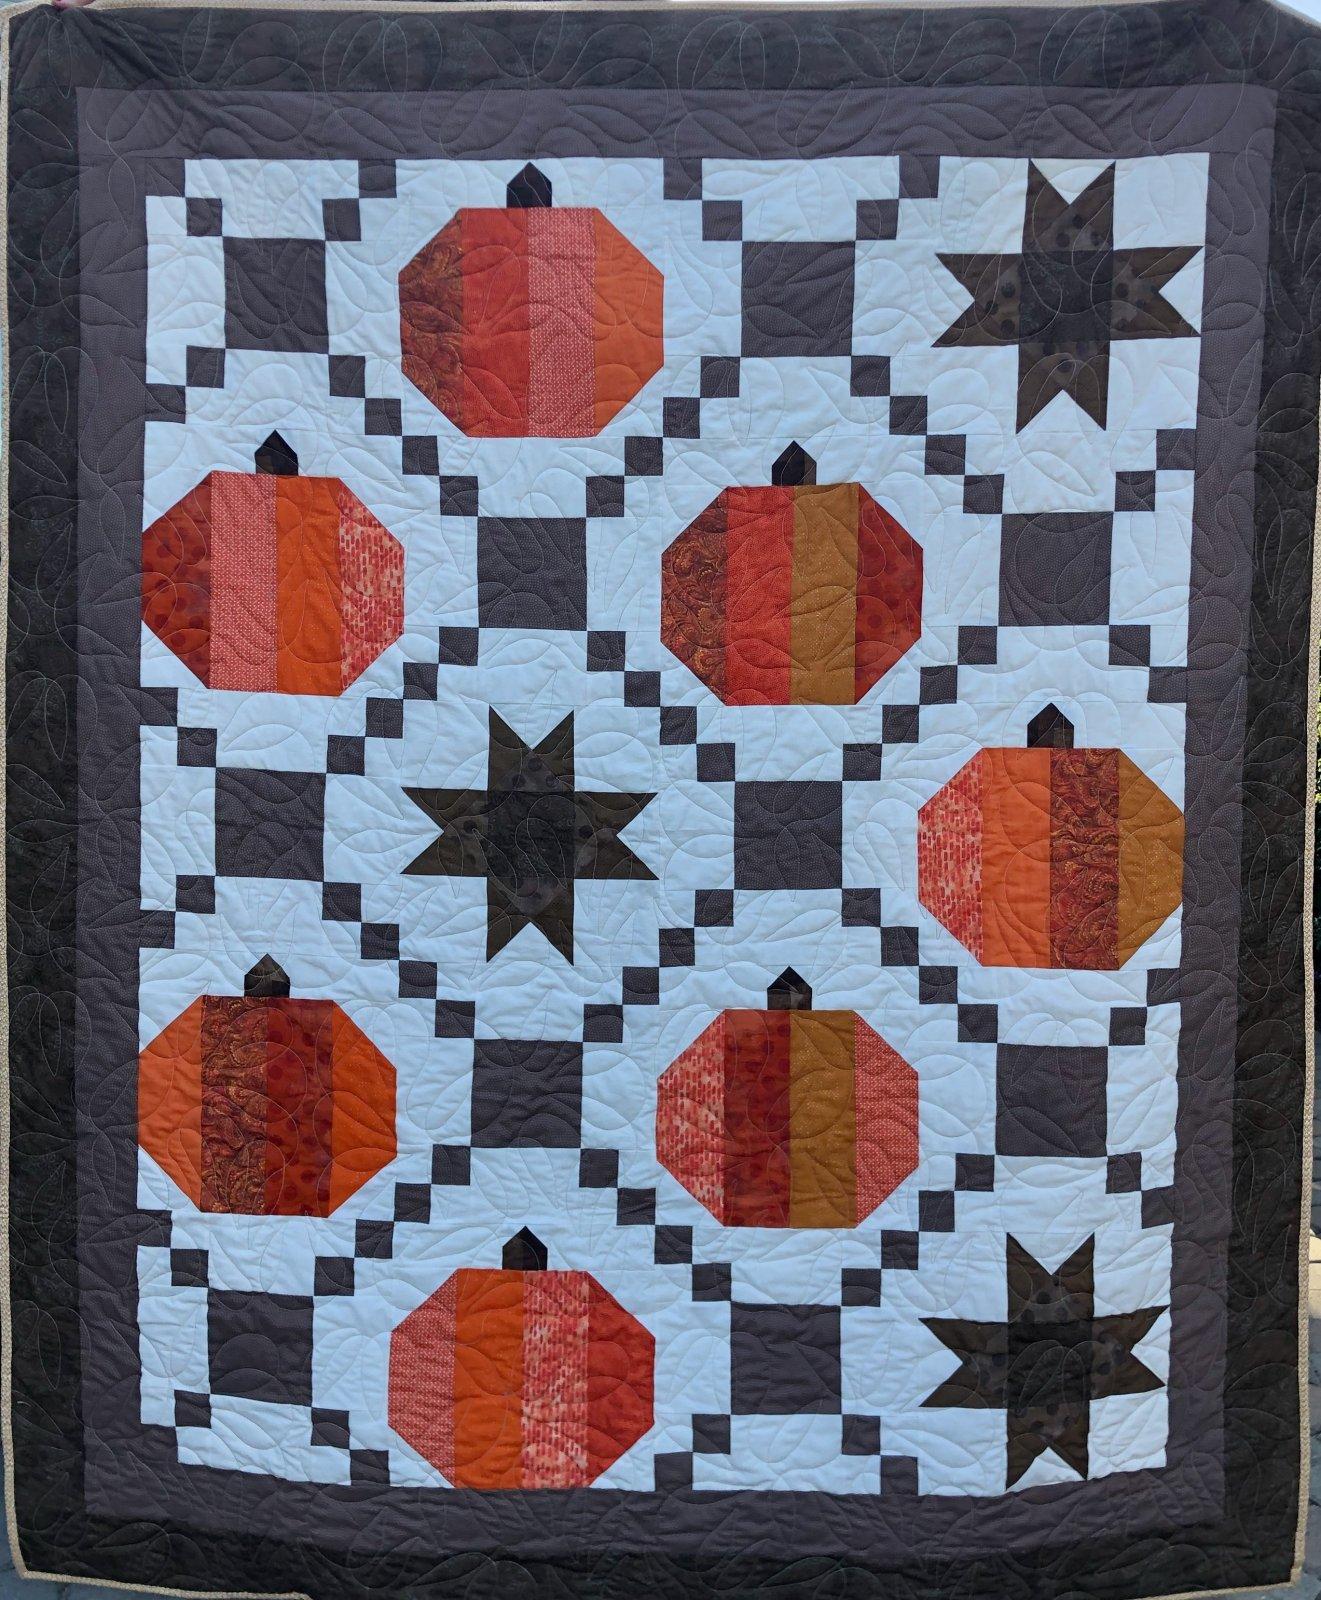 Pumpkin Spice Quilt Kit -  63' x 75'